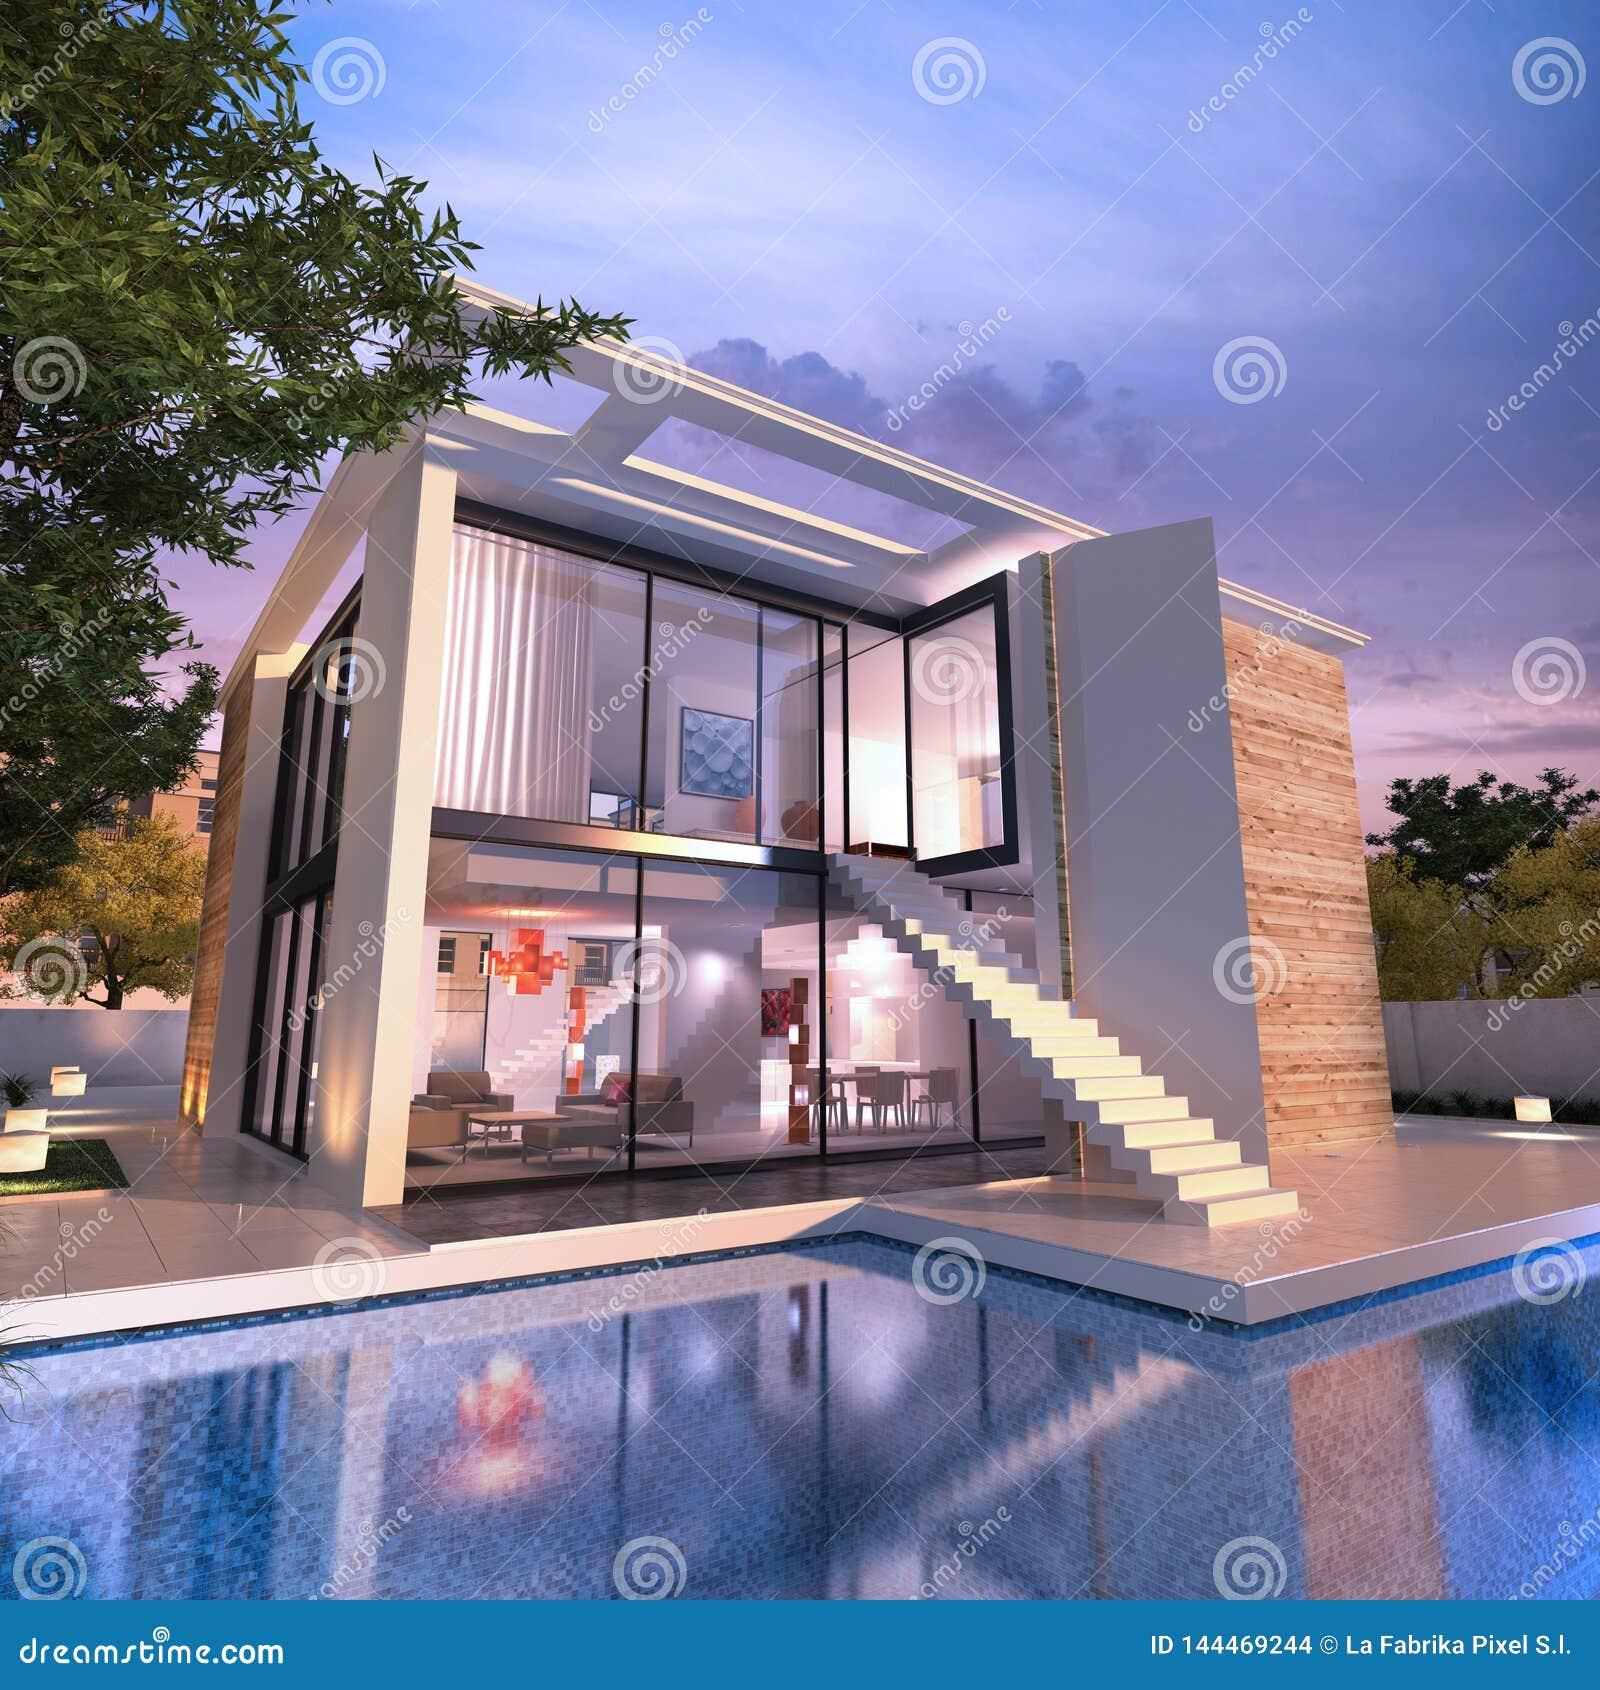 Modern House Pool Stock Illustrations 6 264 Modern House Pool Stock Illustrations Vectors Clipart Dreamstime